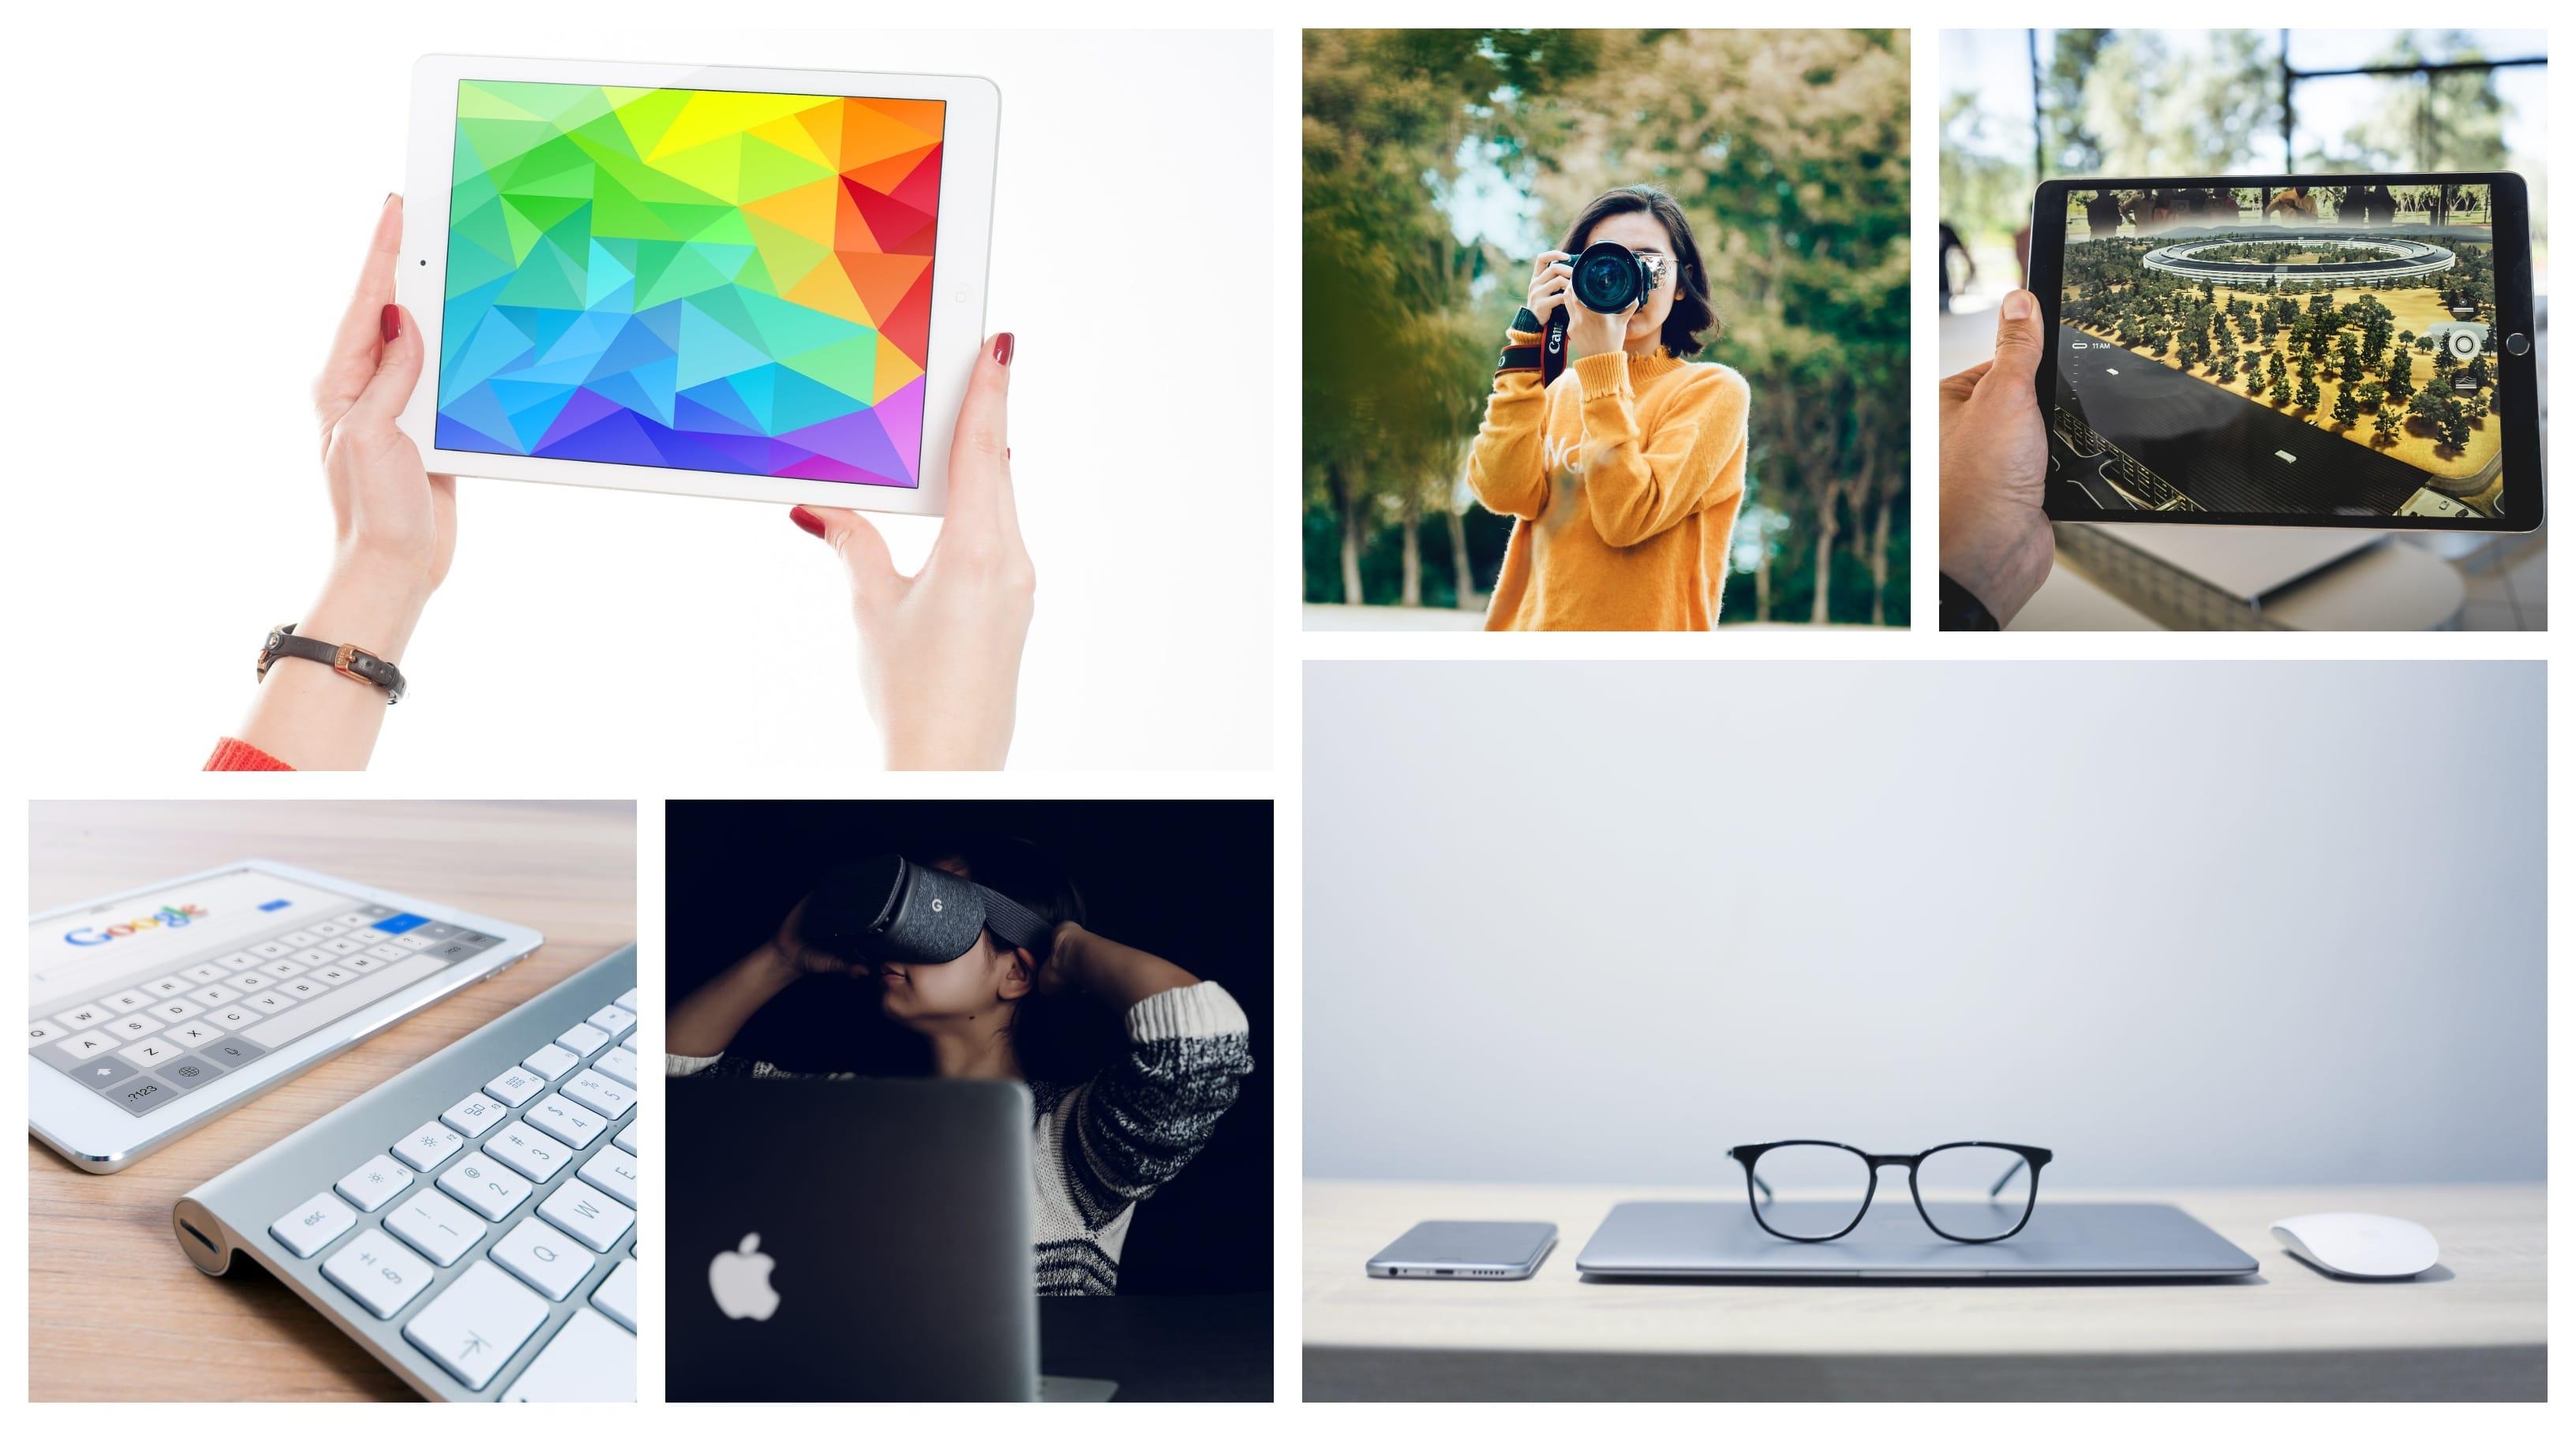 How ZUO Creates Digital Content